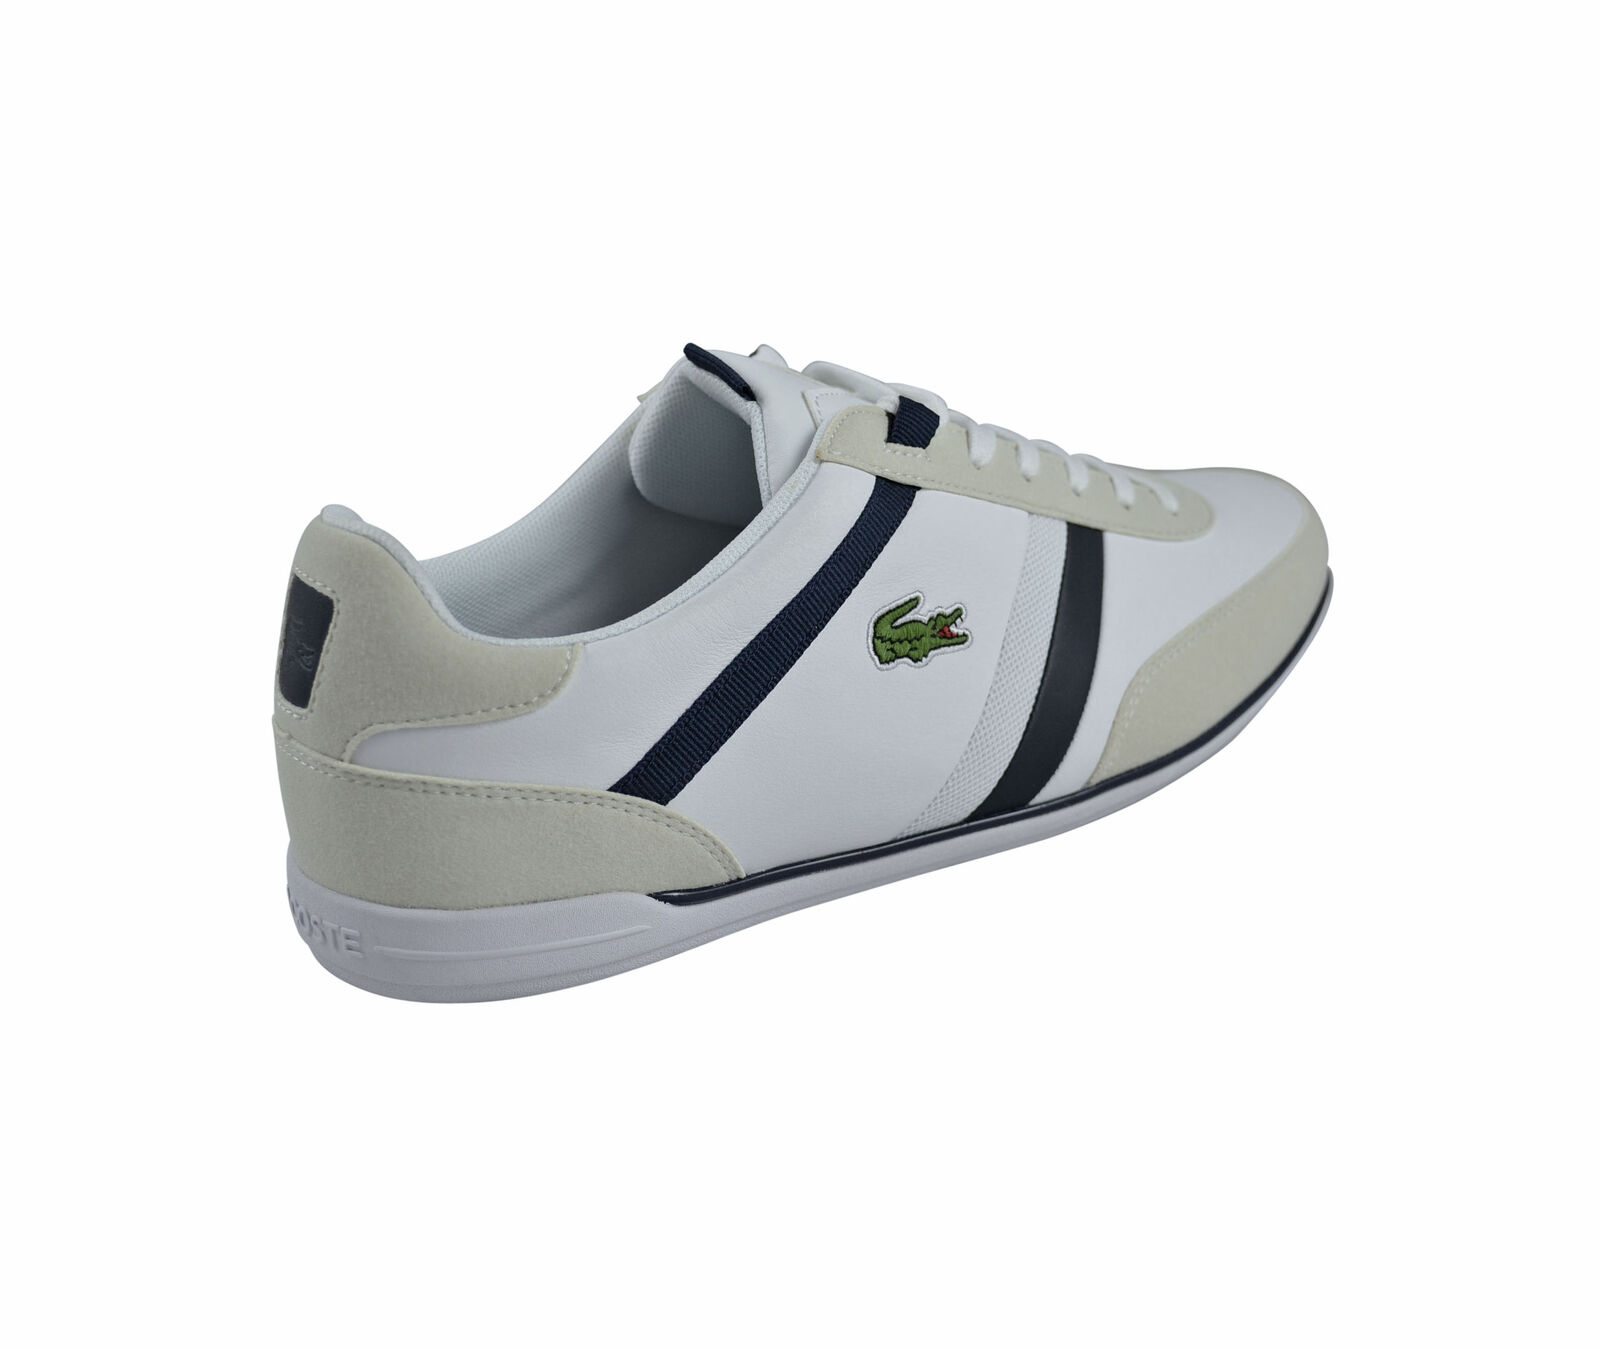 Lacoste Giron 116 1 SPM SPM SPM white Schuhe/Sneaker weiß b8c327